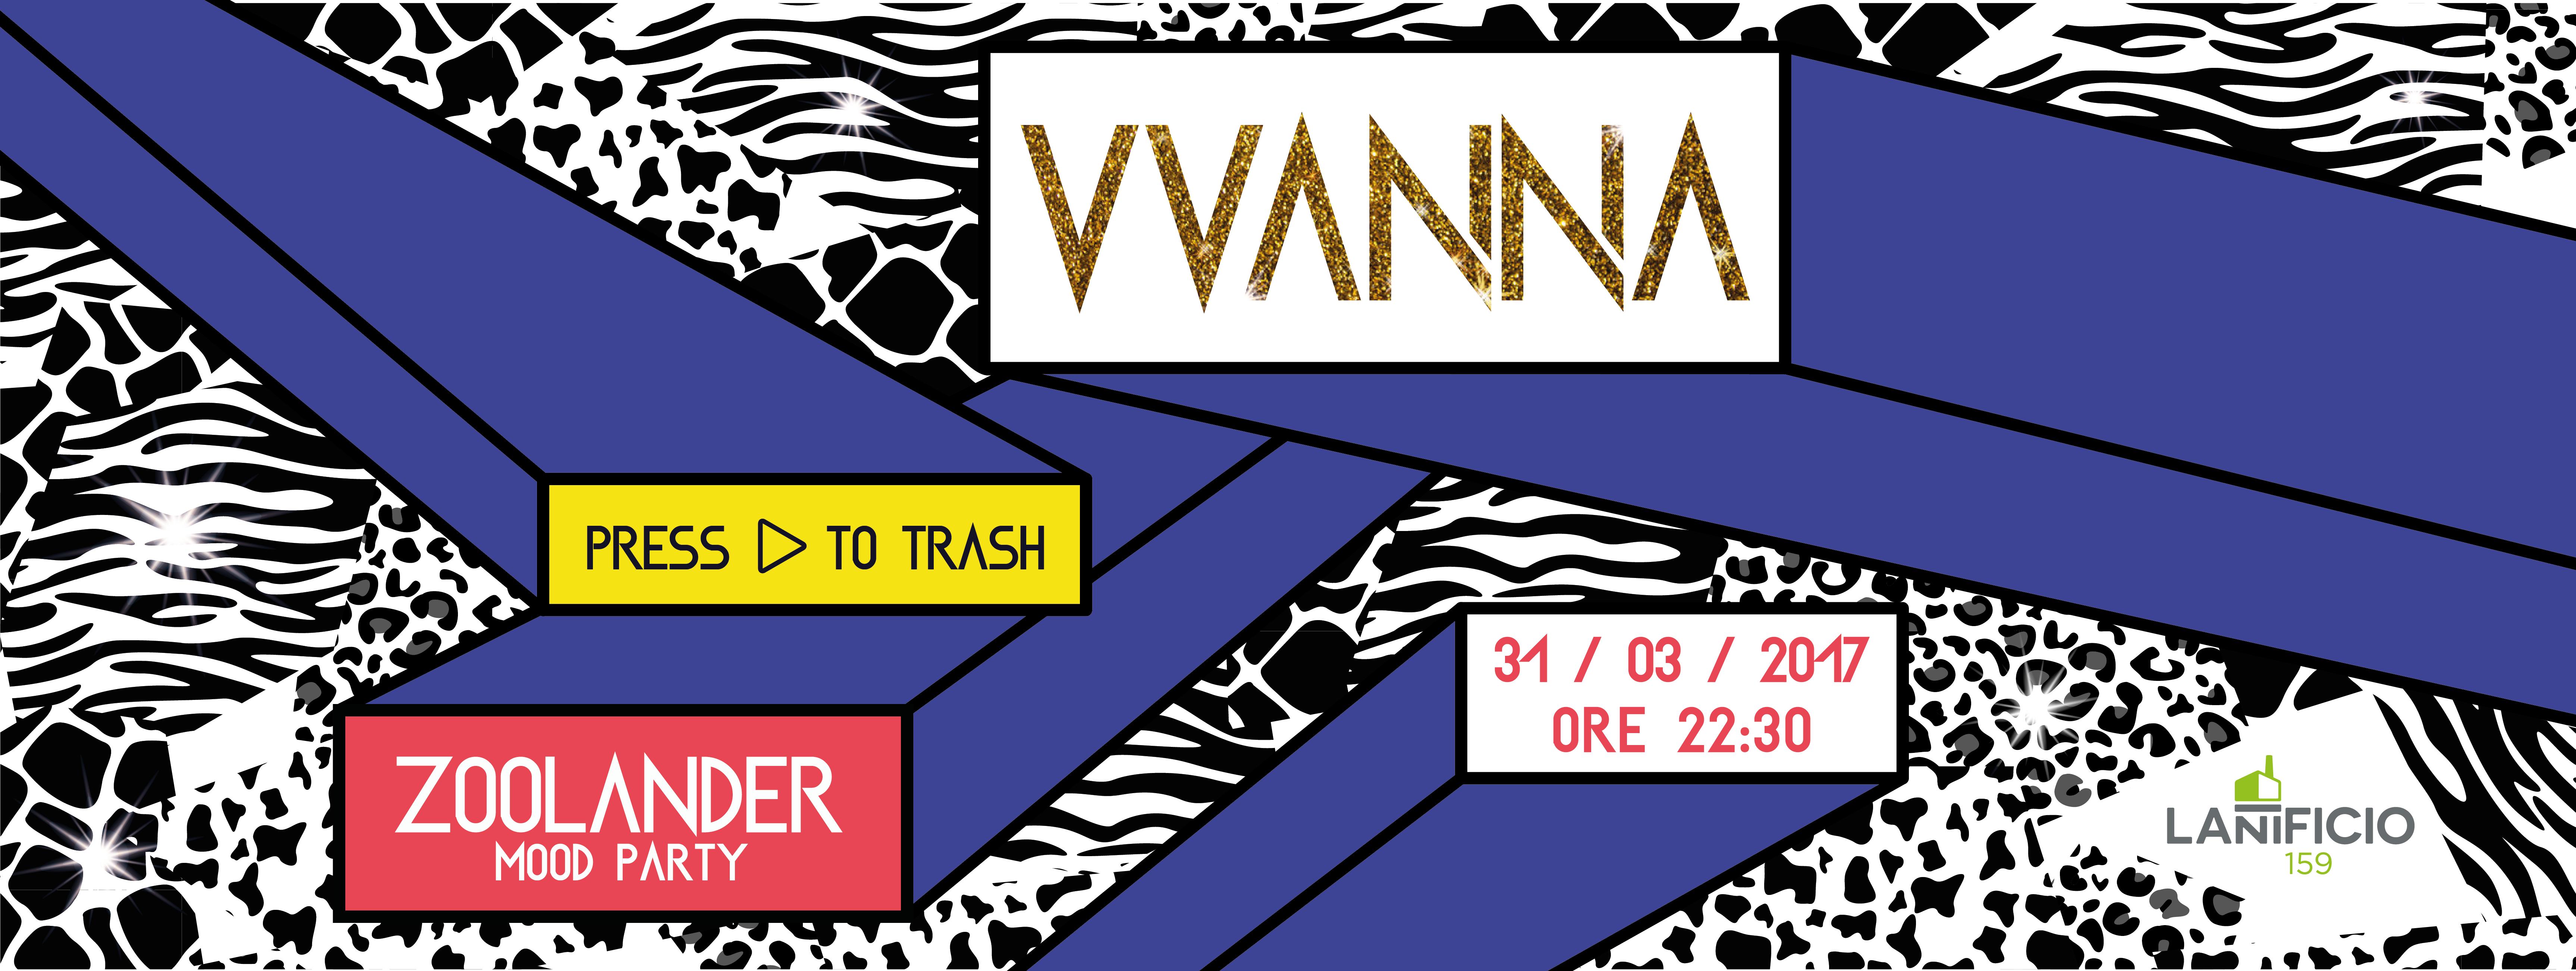 Wanna Trash Party 31.03.2017 @Lanificio159